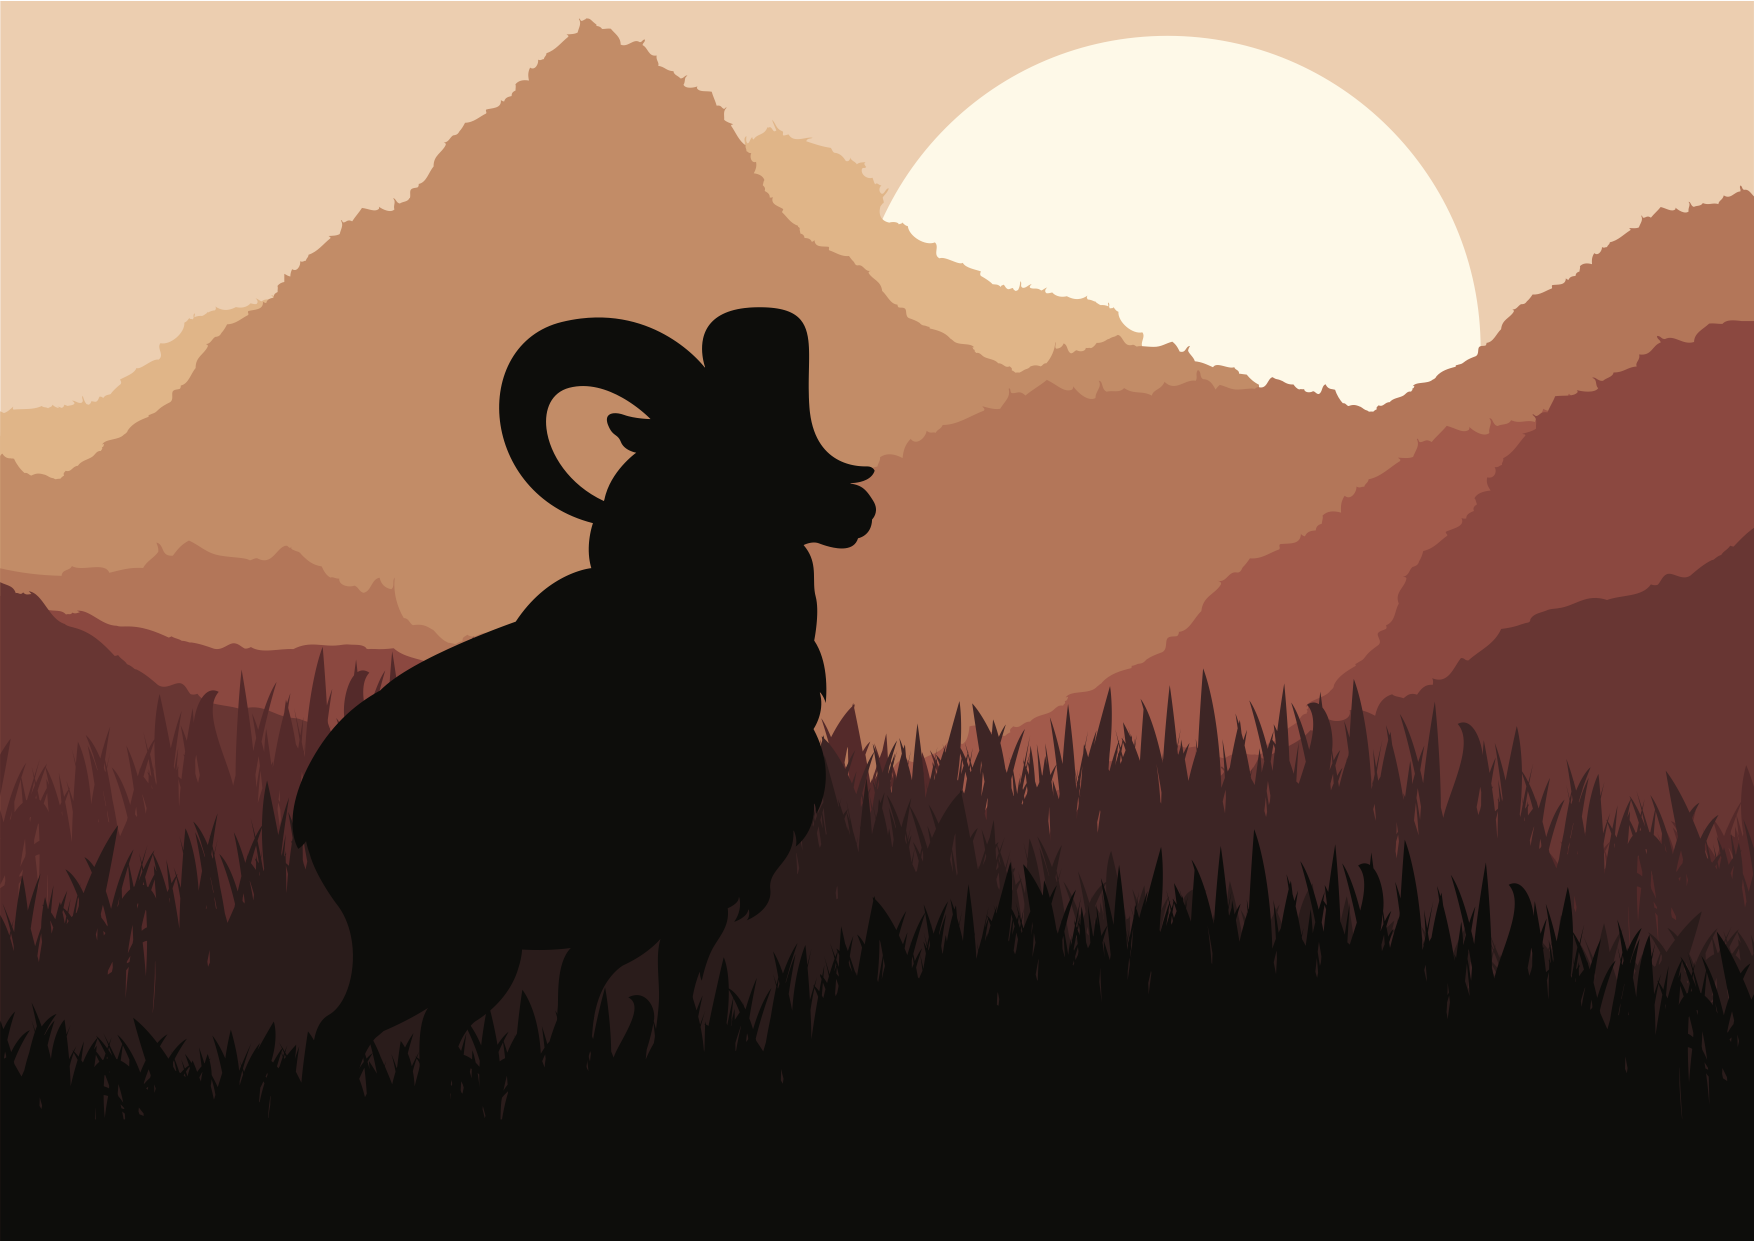 Mountain goat in wild nature landscape illustration